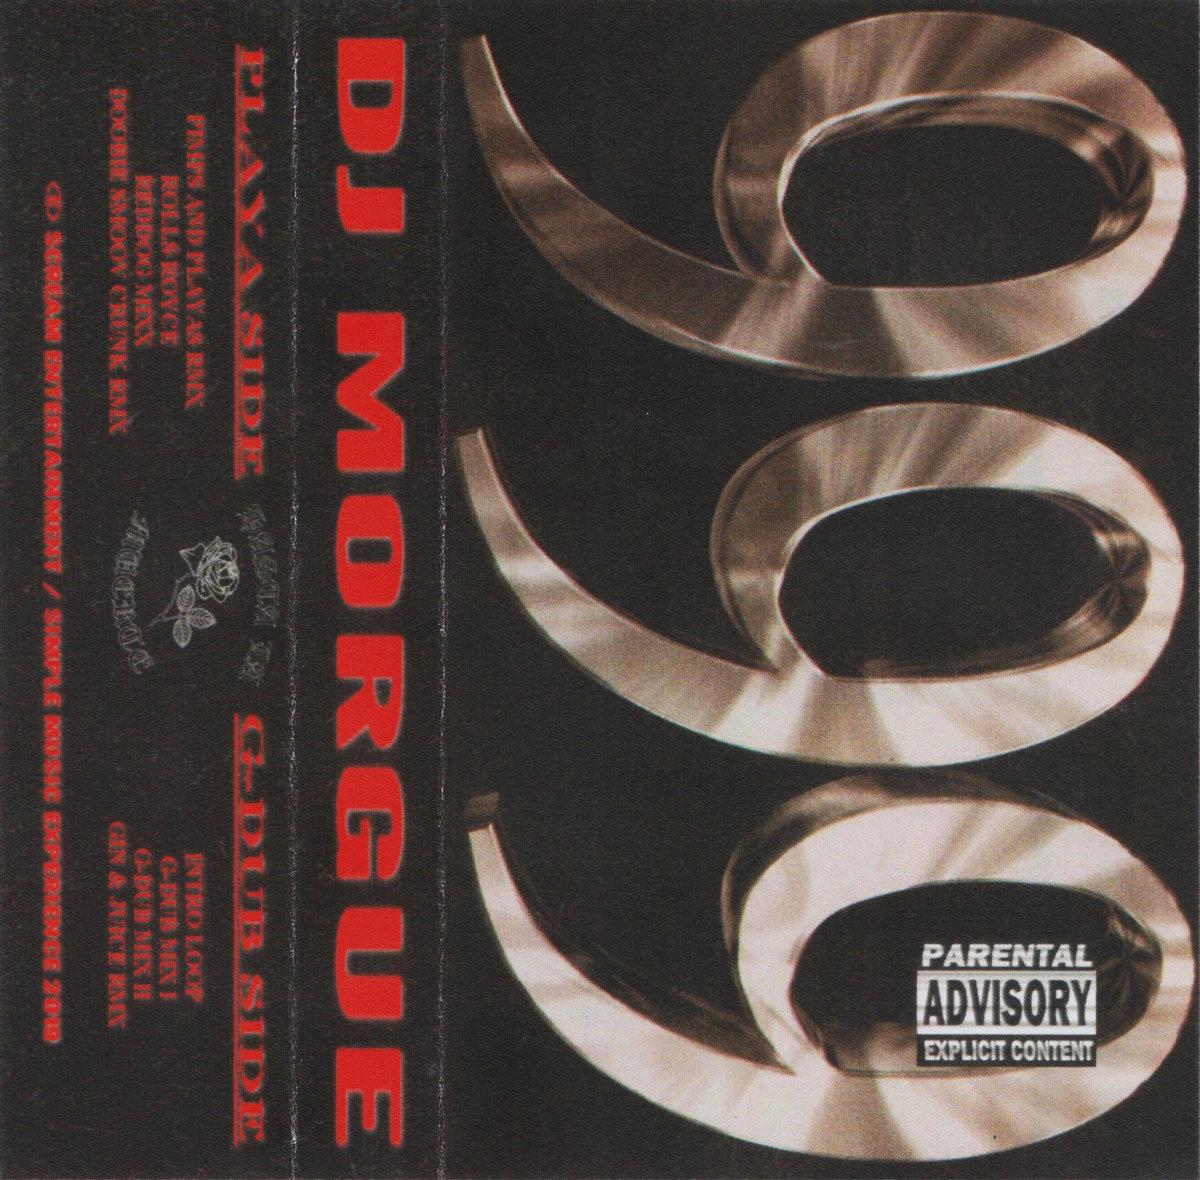 G-DUB SIDE) INTRO LOOP | SCREAM ENTERTAINMENT